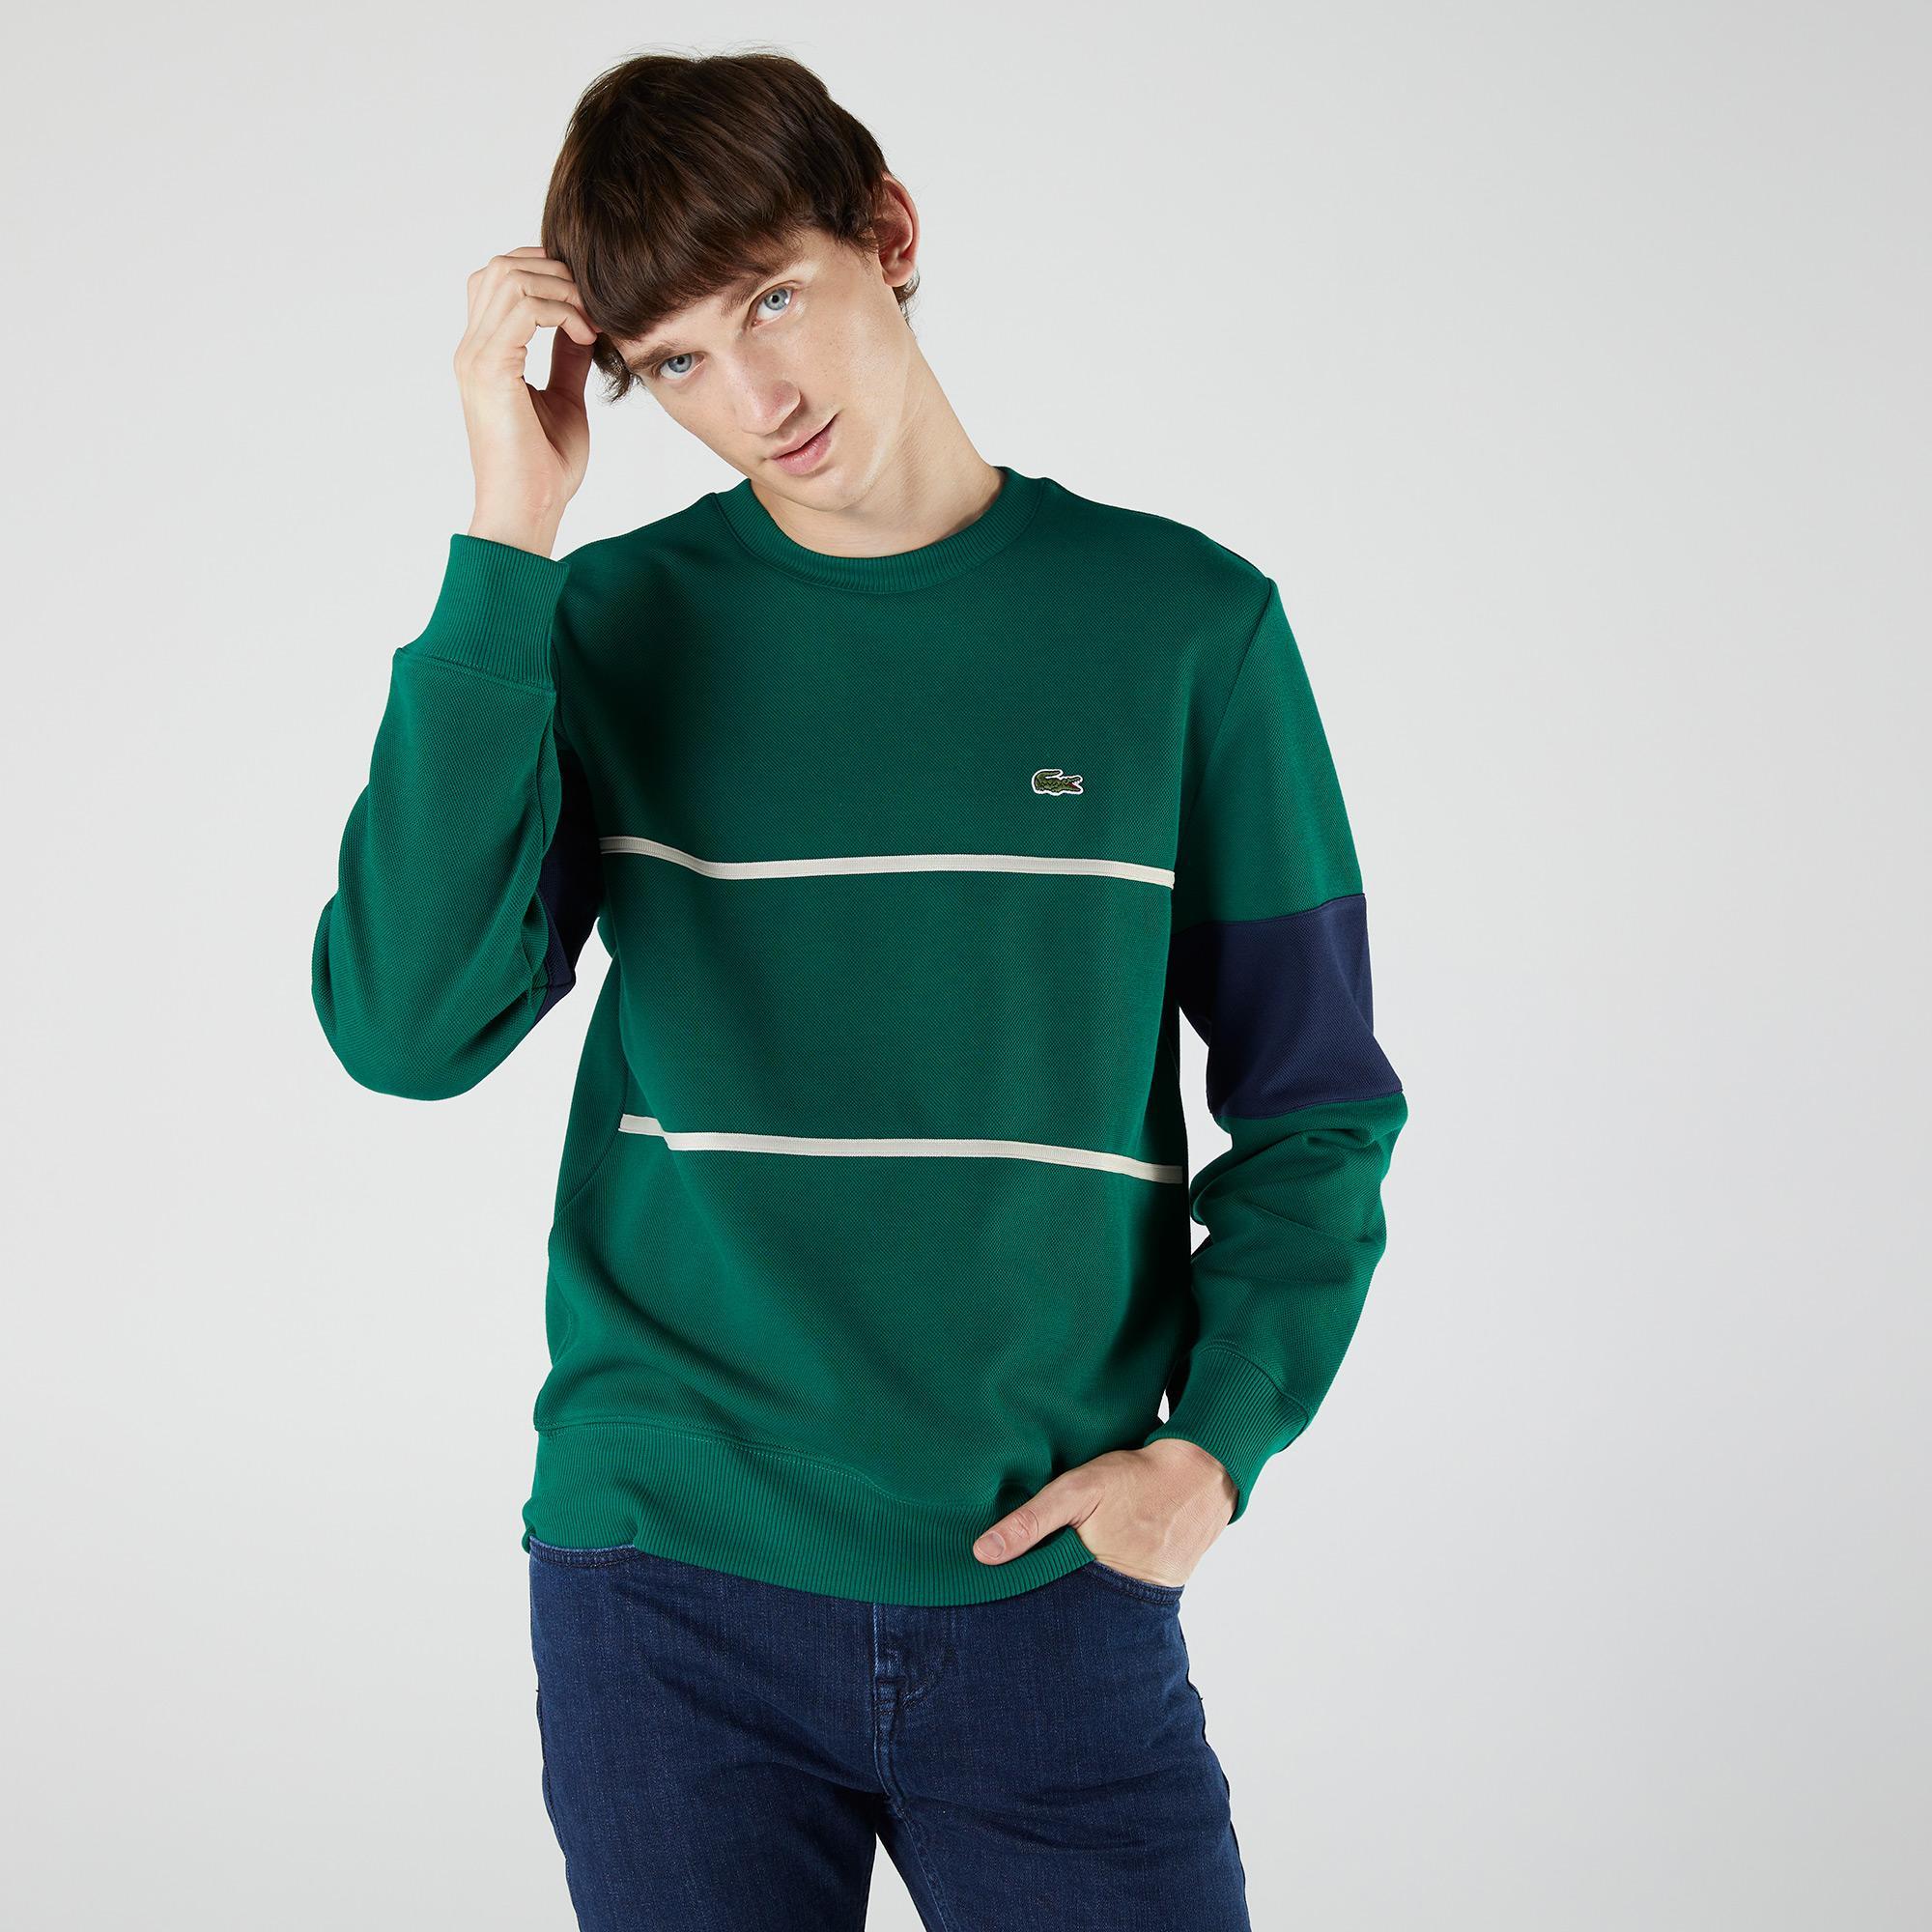 Lacoste Heritage Erkek Classic Fit Bisiklet Yaka Renk Bloklu Yeşil Sweatshirt